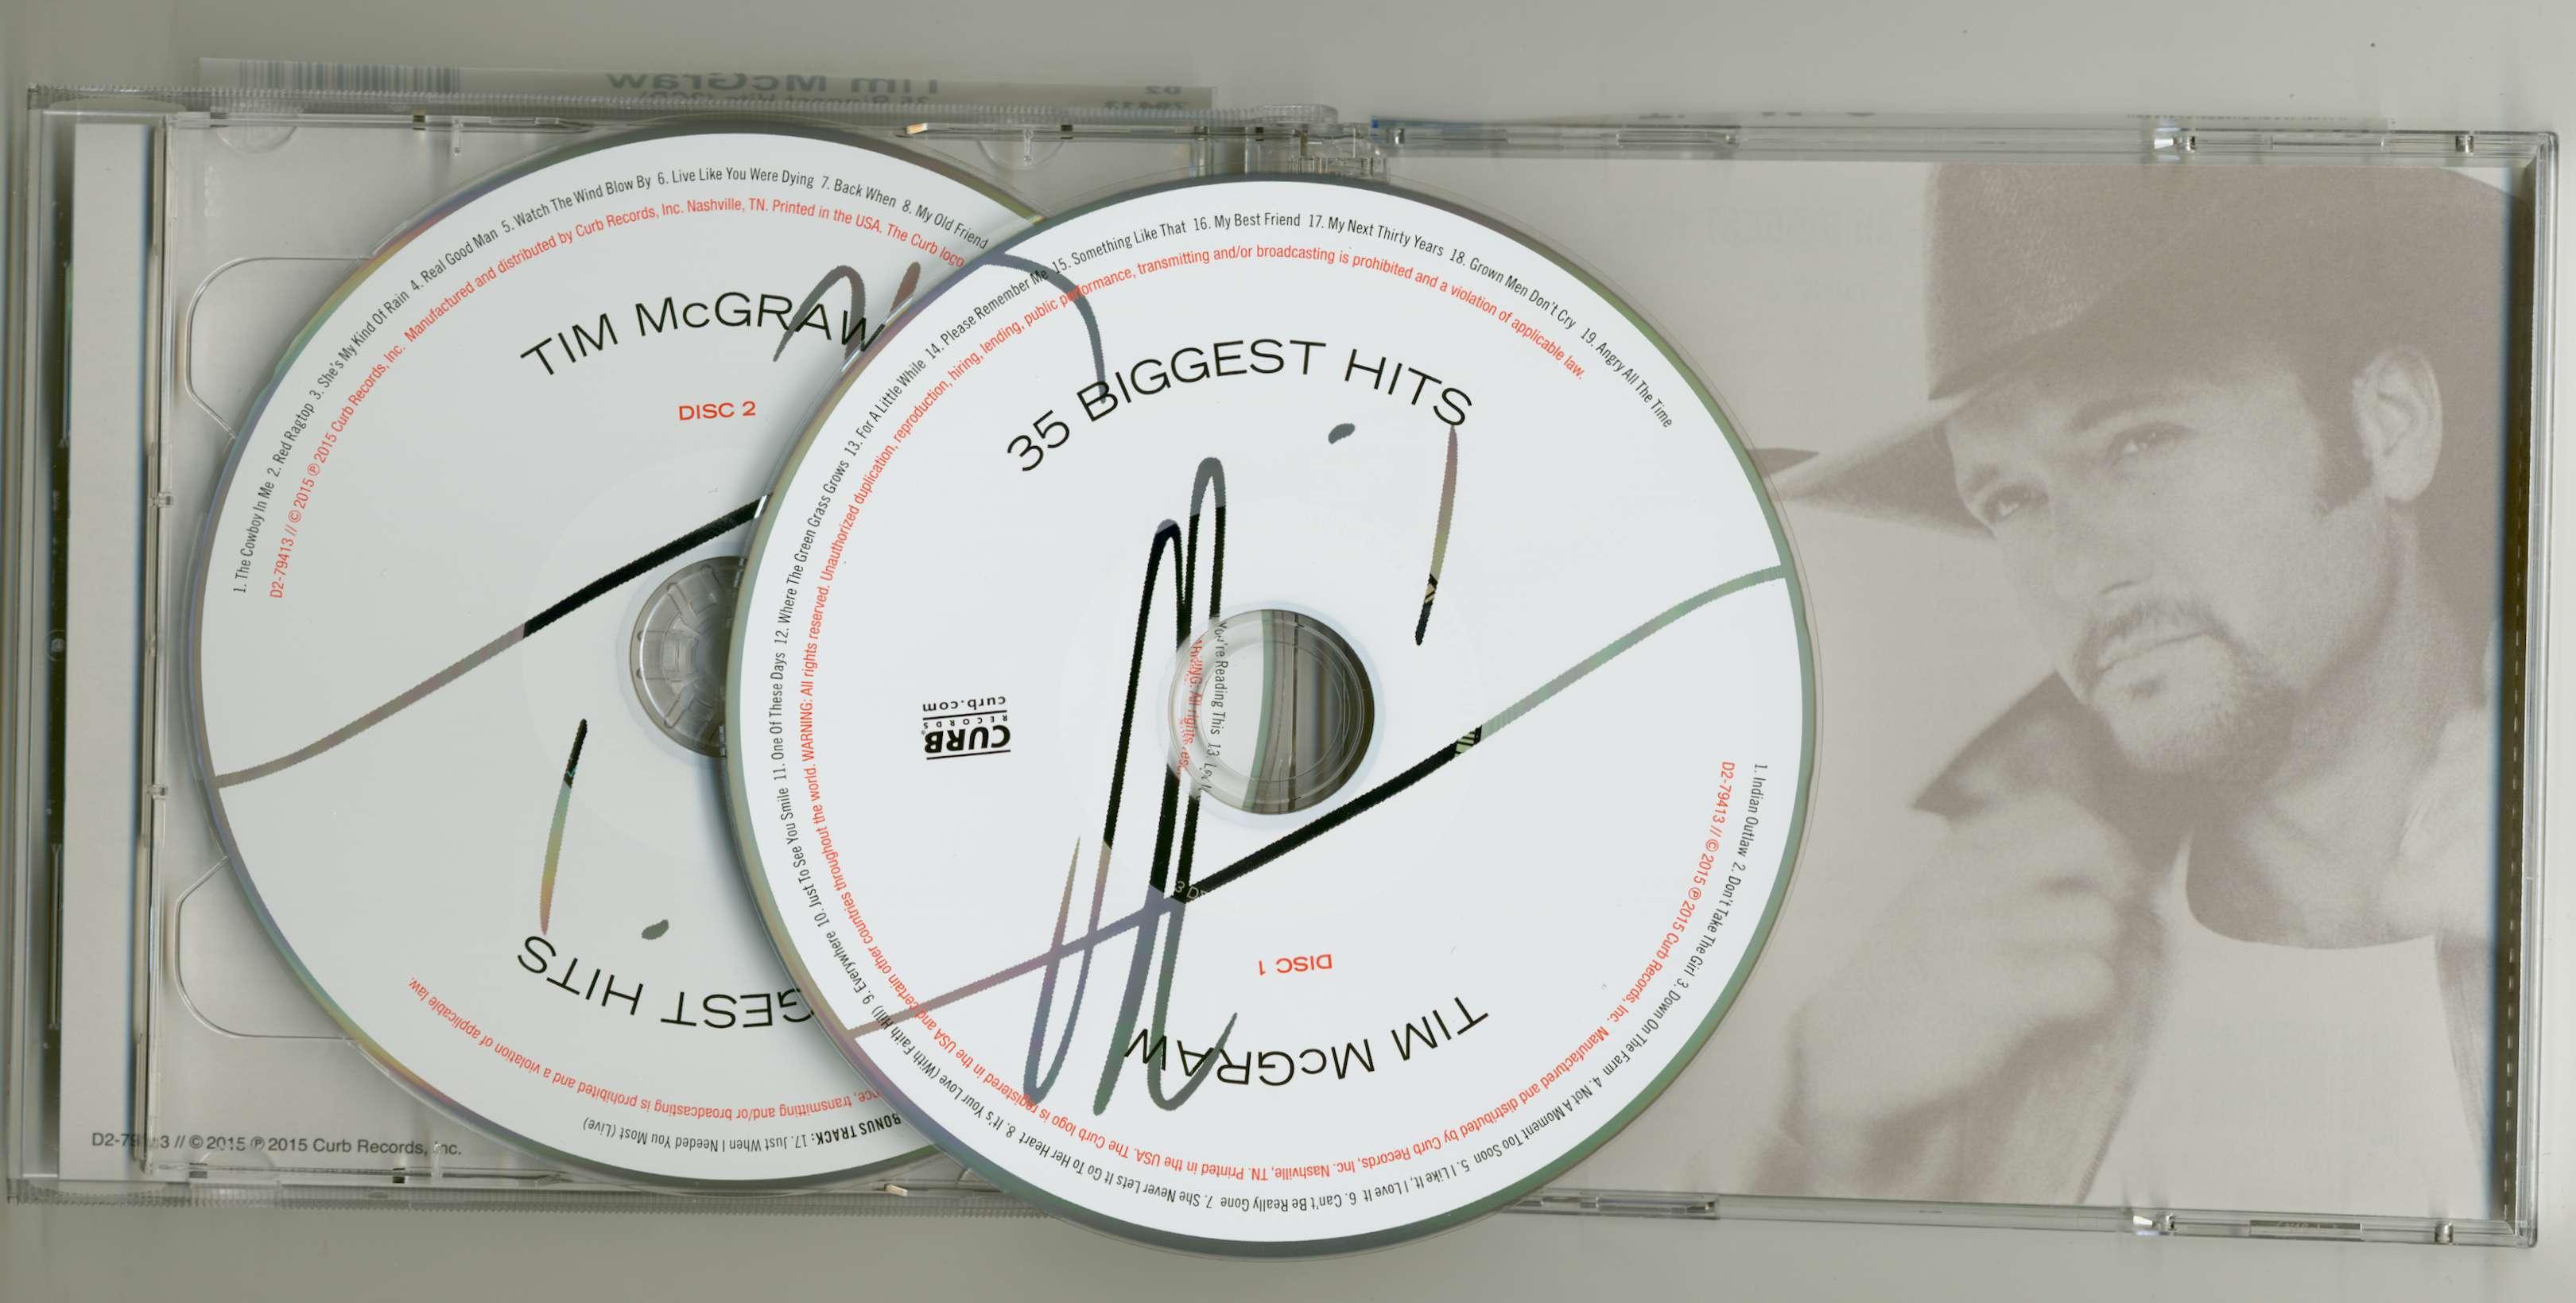 tim mcgraw cd 35 biggest hits 2 cd bear family records